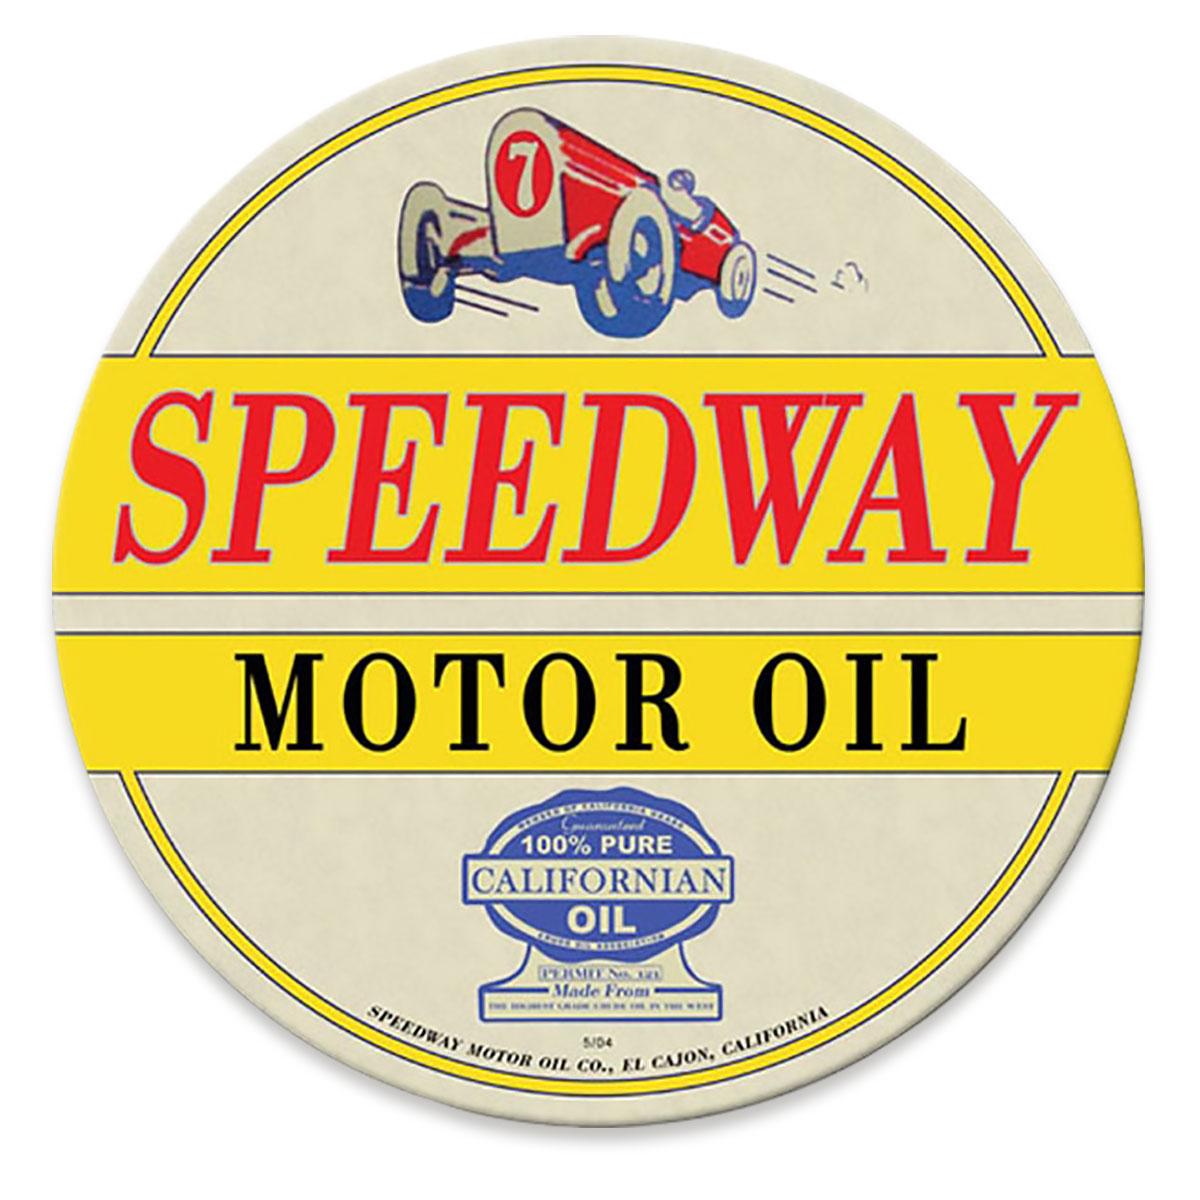 Speedway Motor Oil sign